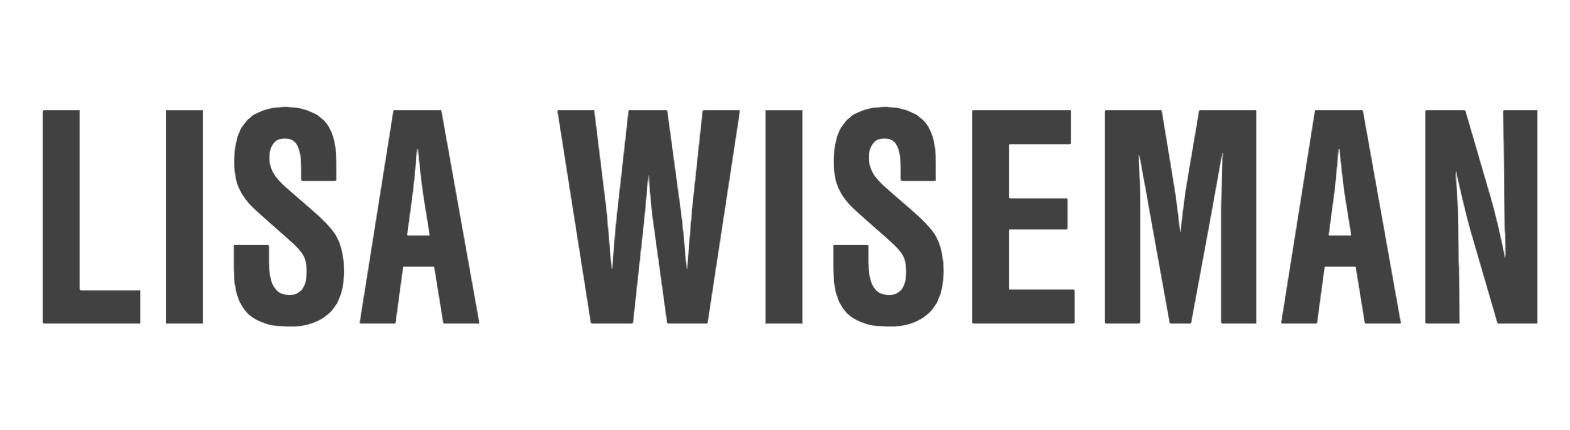 Lisa Wiseman: At-Edge Photography Case Study